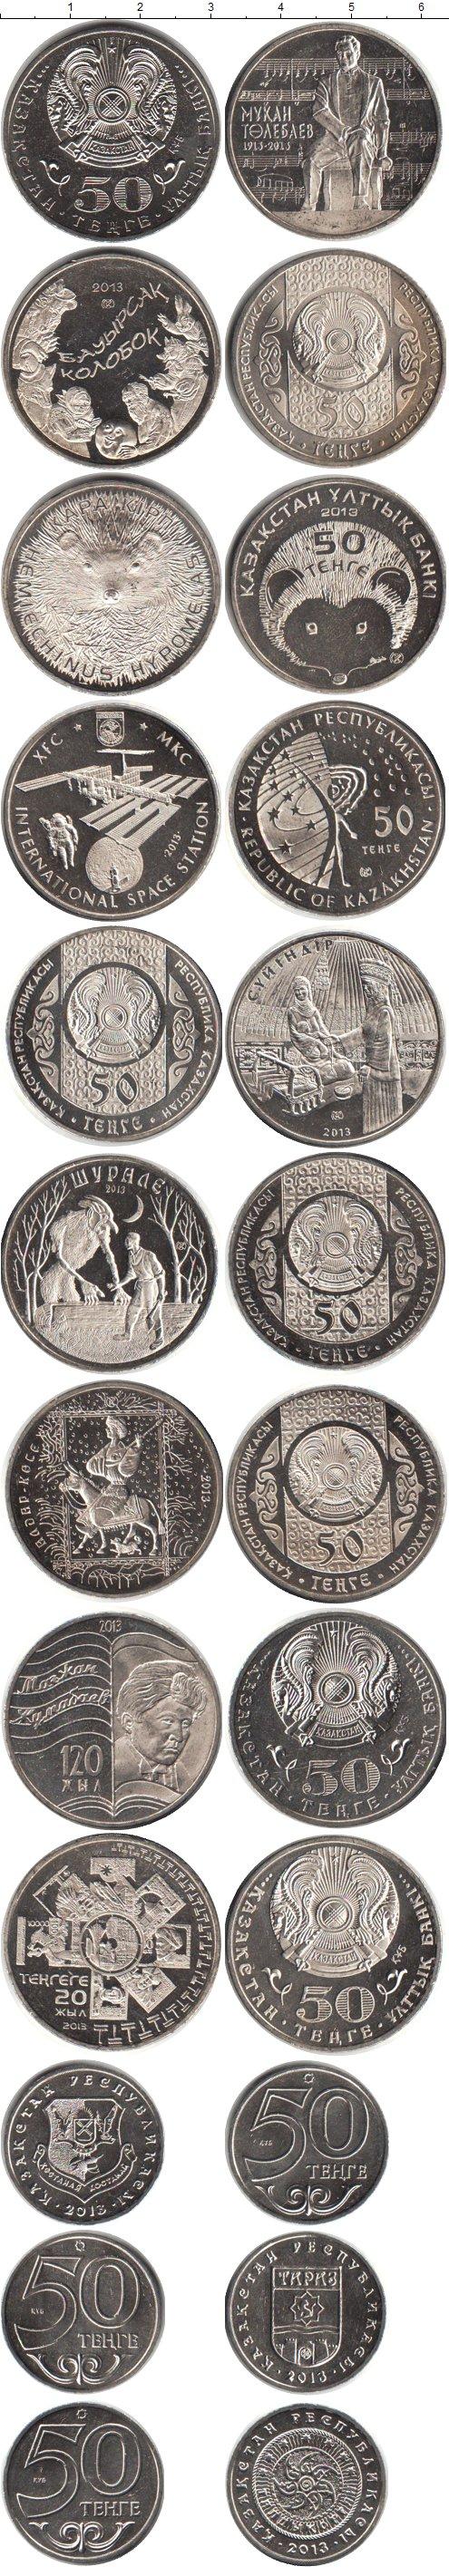 Картинка Наборы монет Казахстан Казахстан 2013 Медно-никель 2013